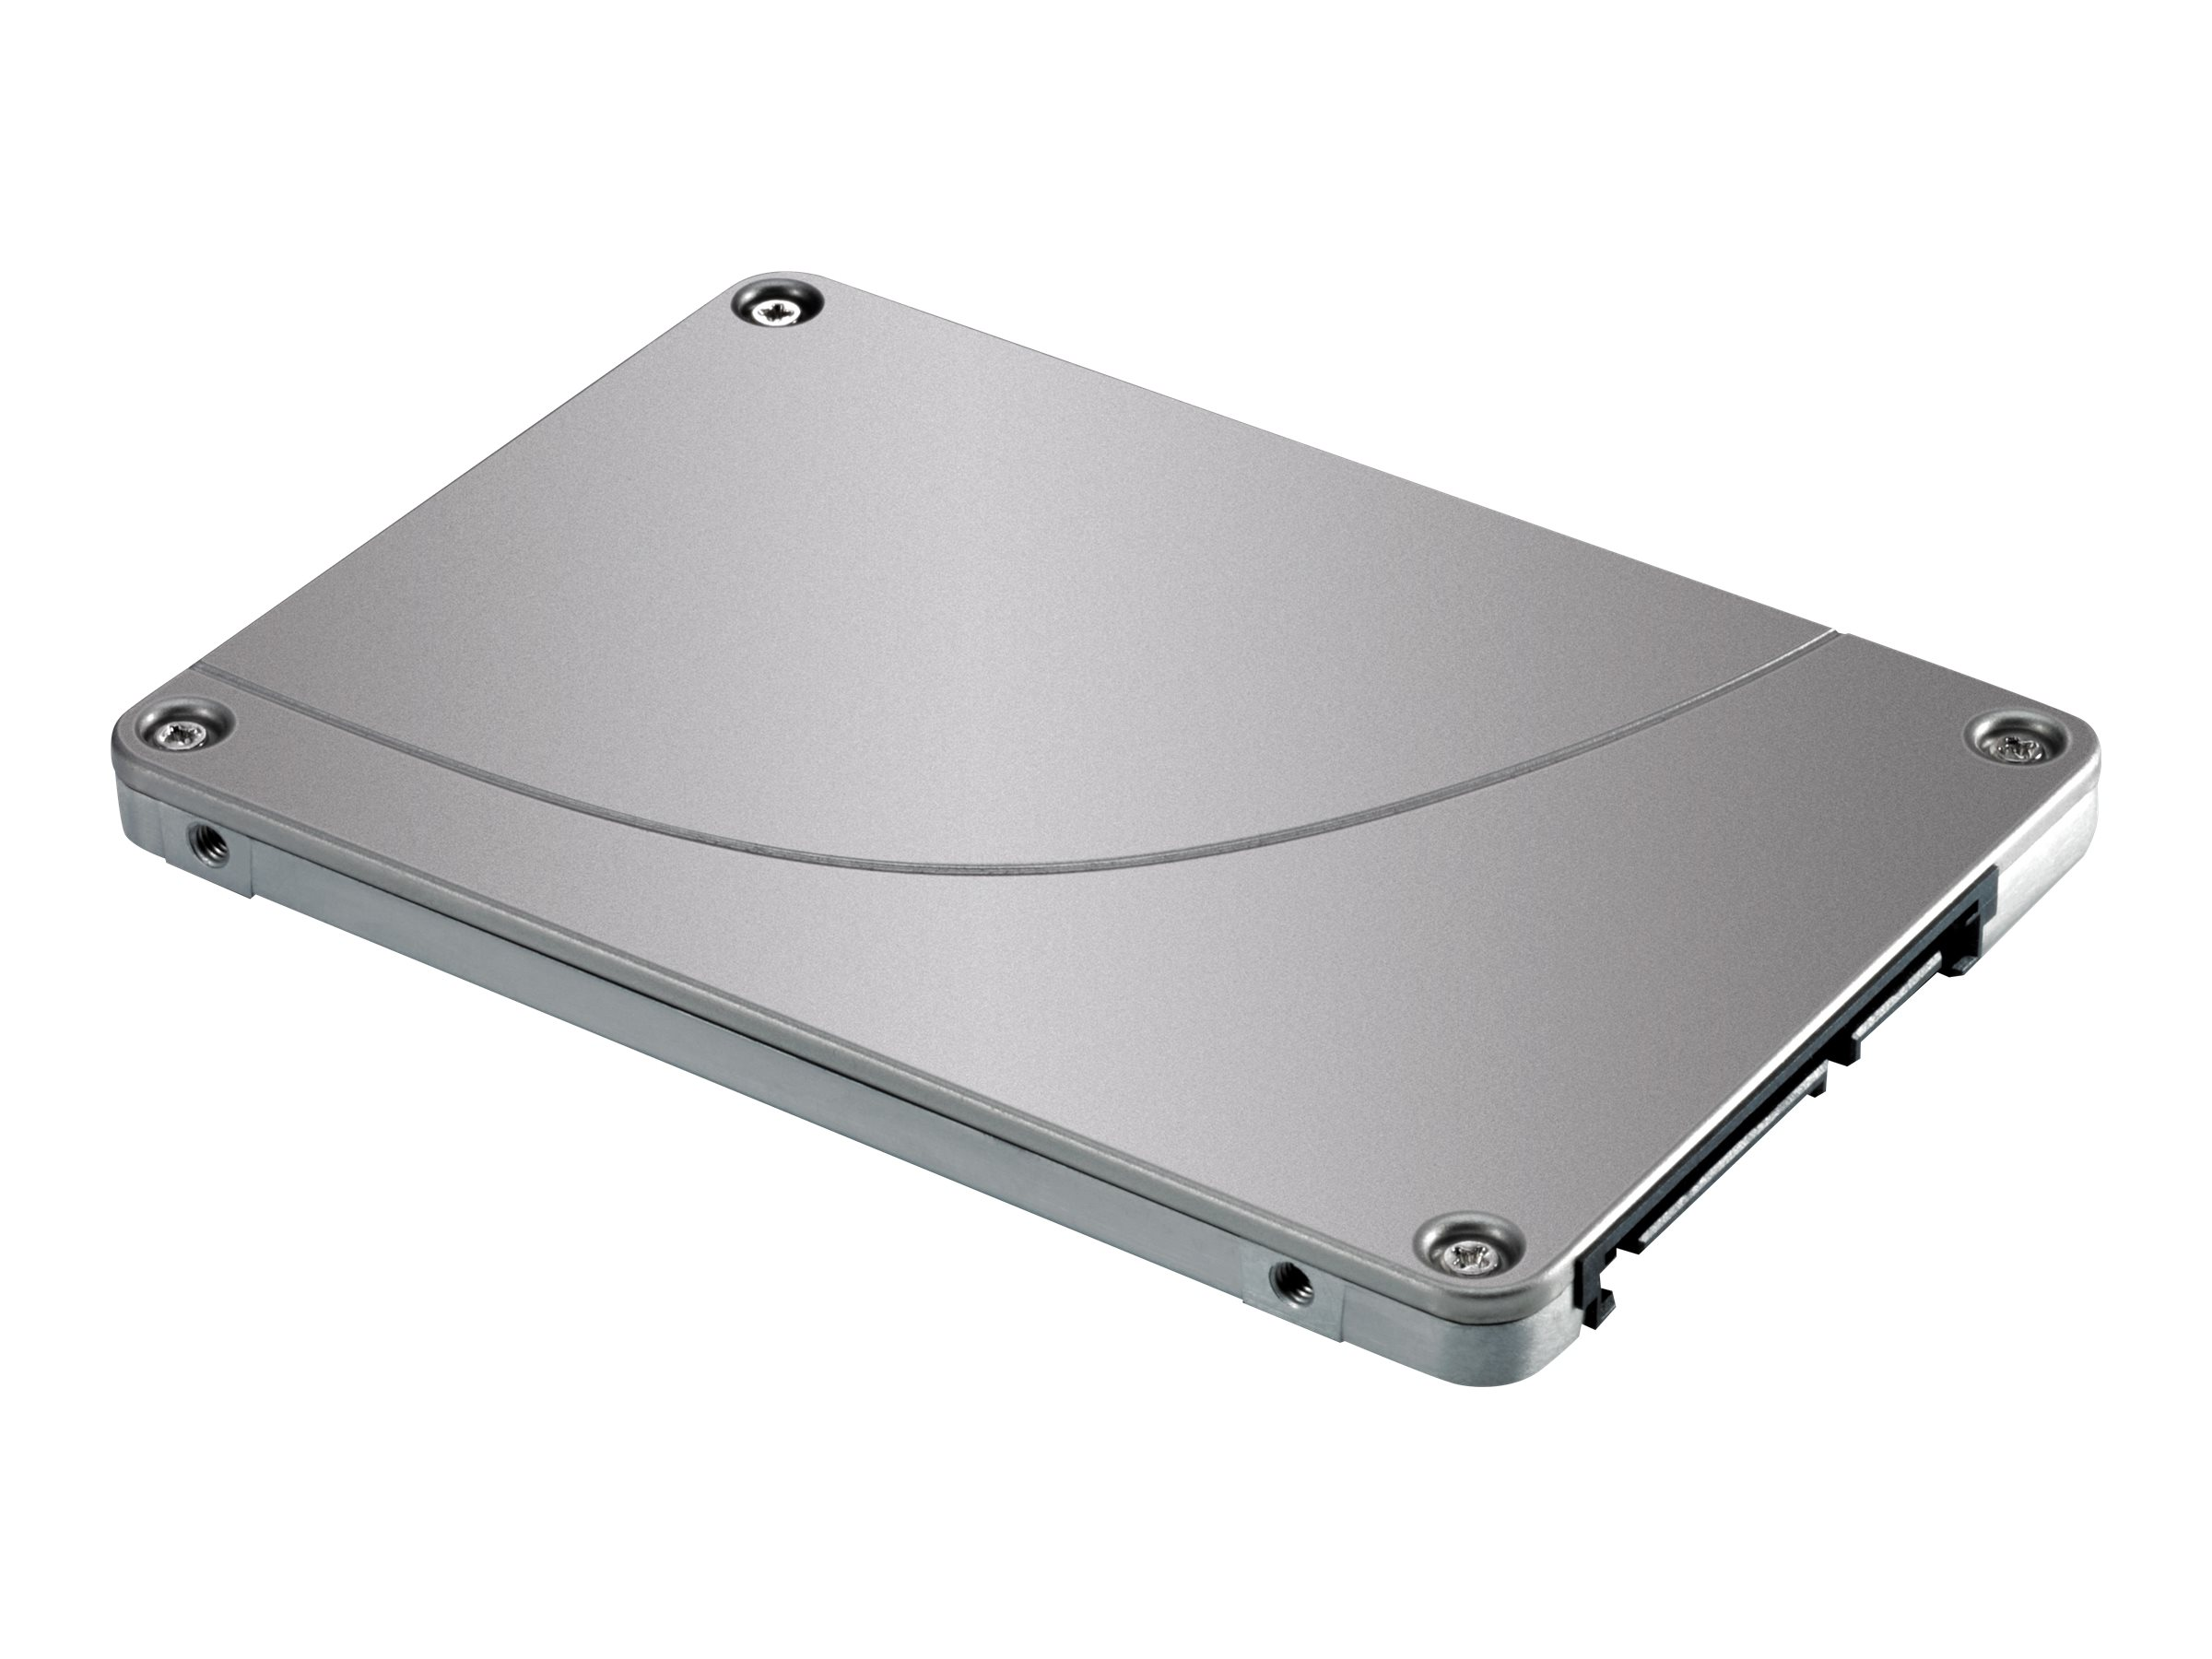 HP - solid state drive - 1 TB - SATA 6Gb/s